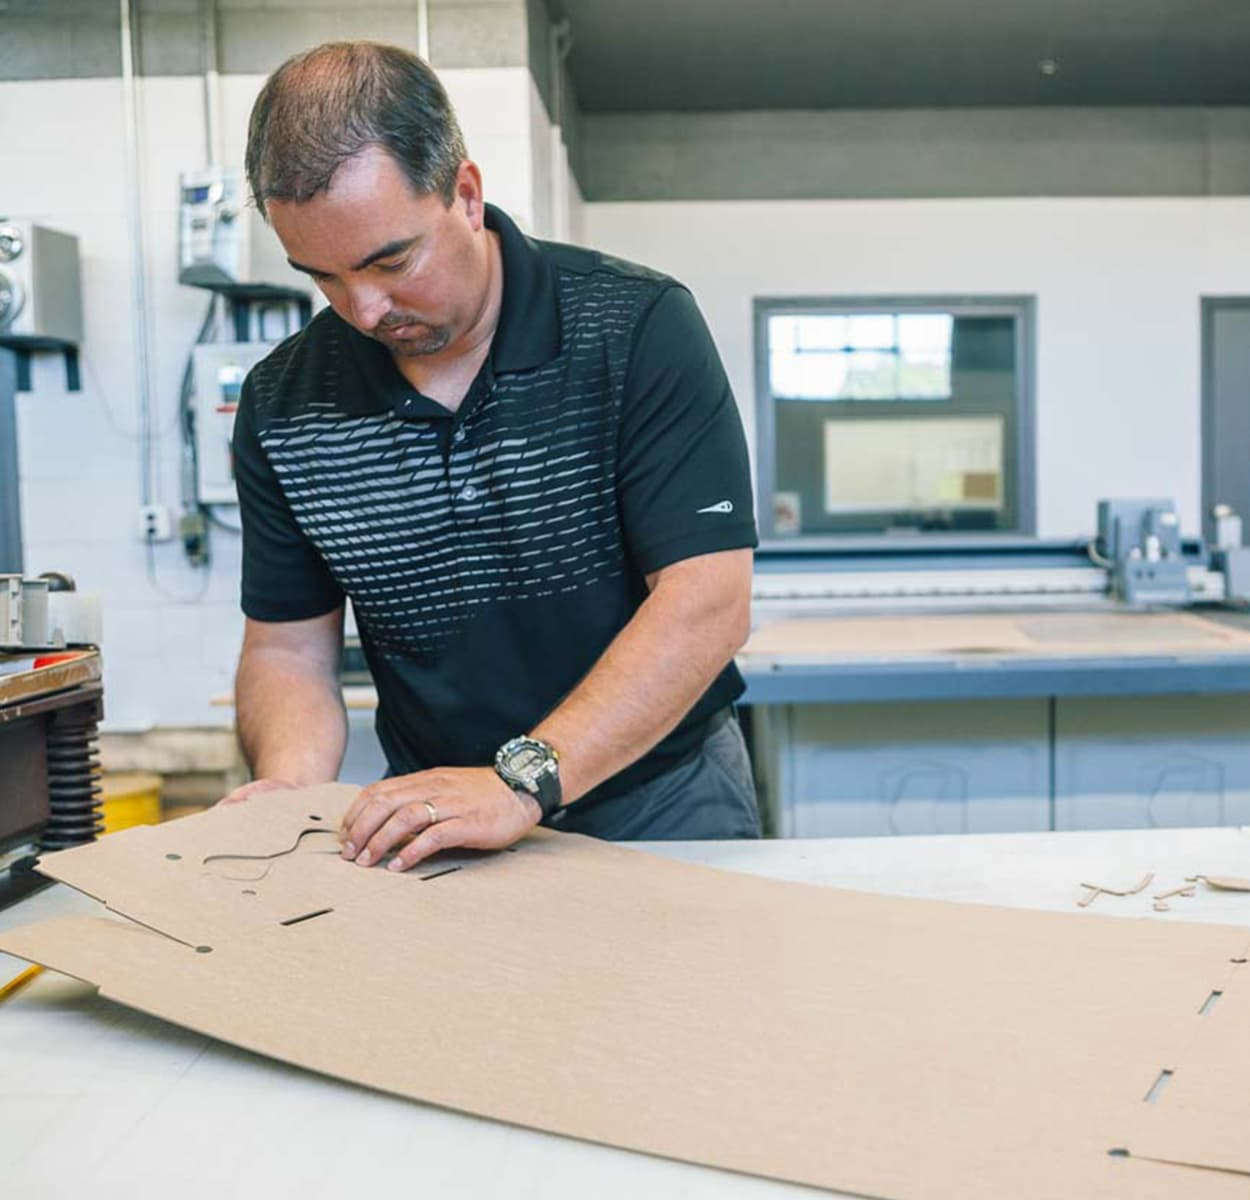 Employee working on paperboard